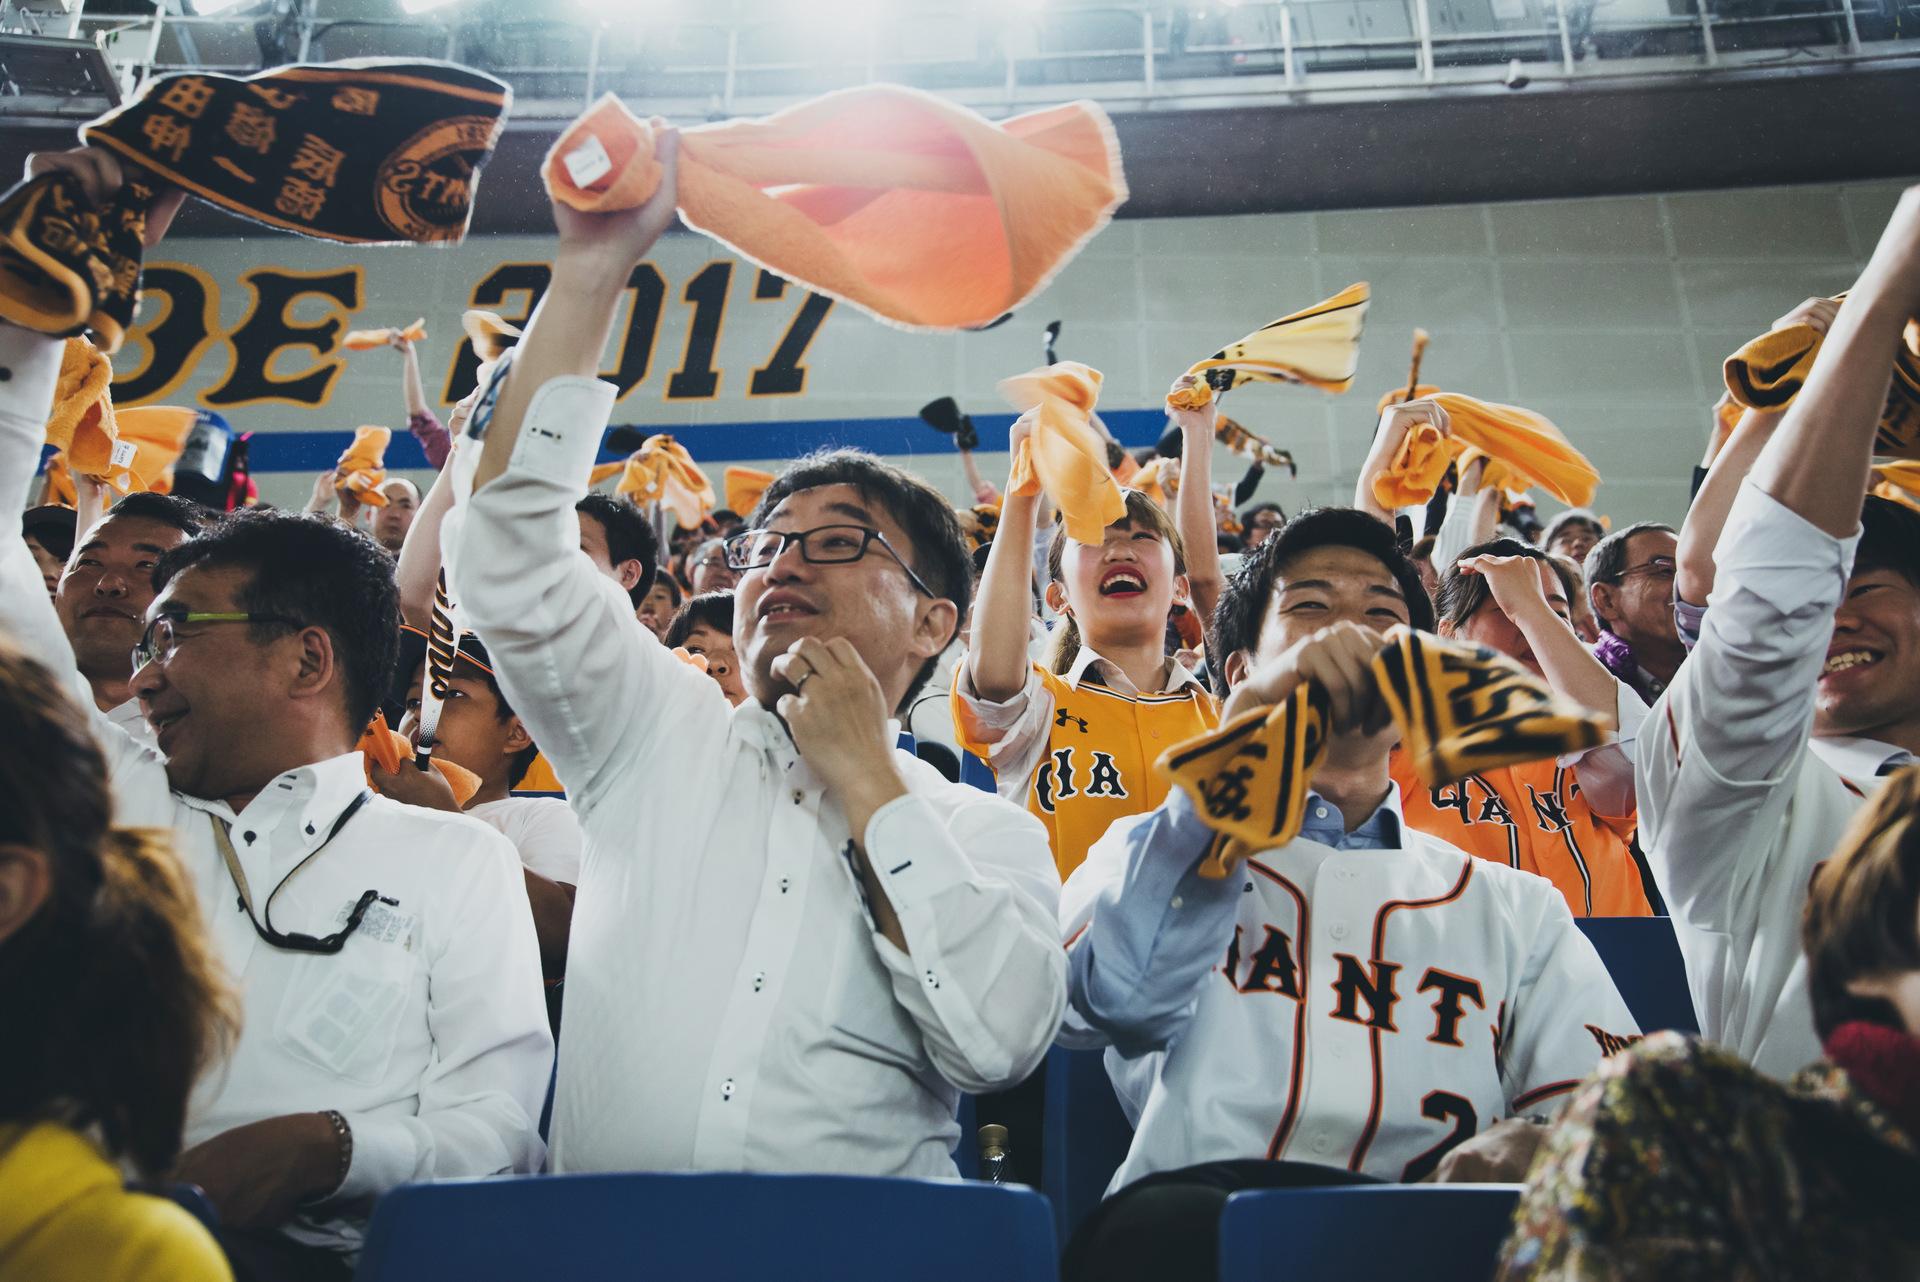 japonia po pracy mecz baseballa